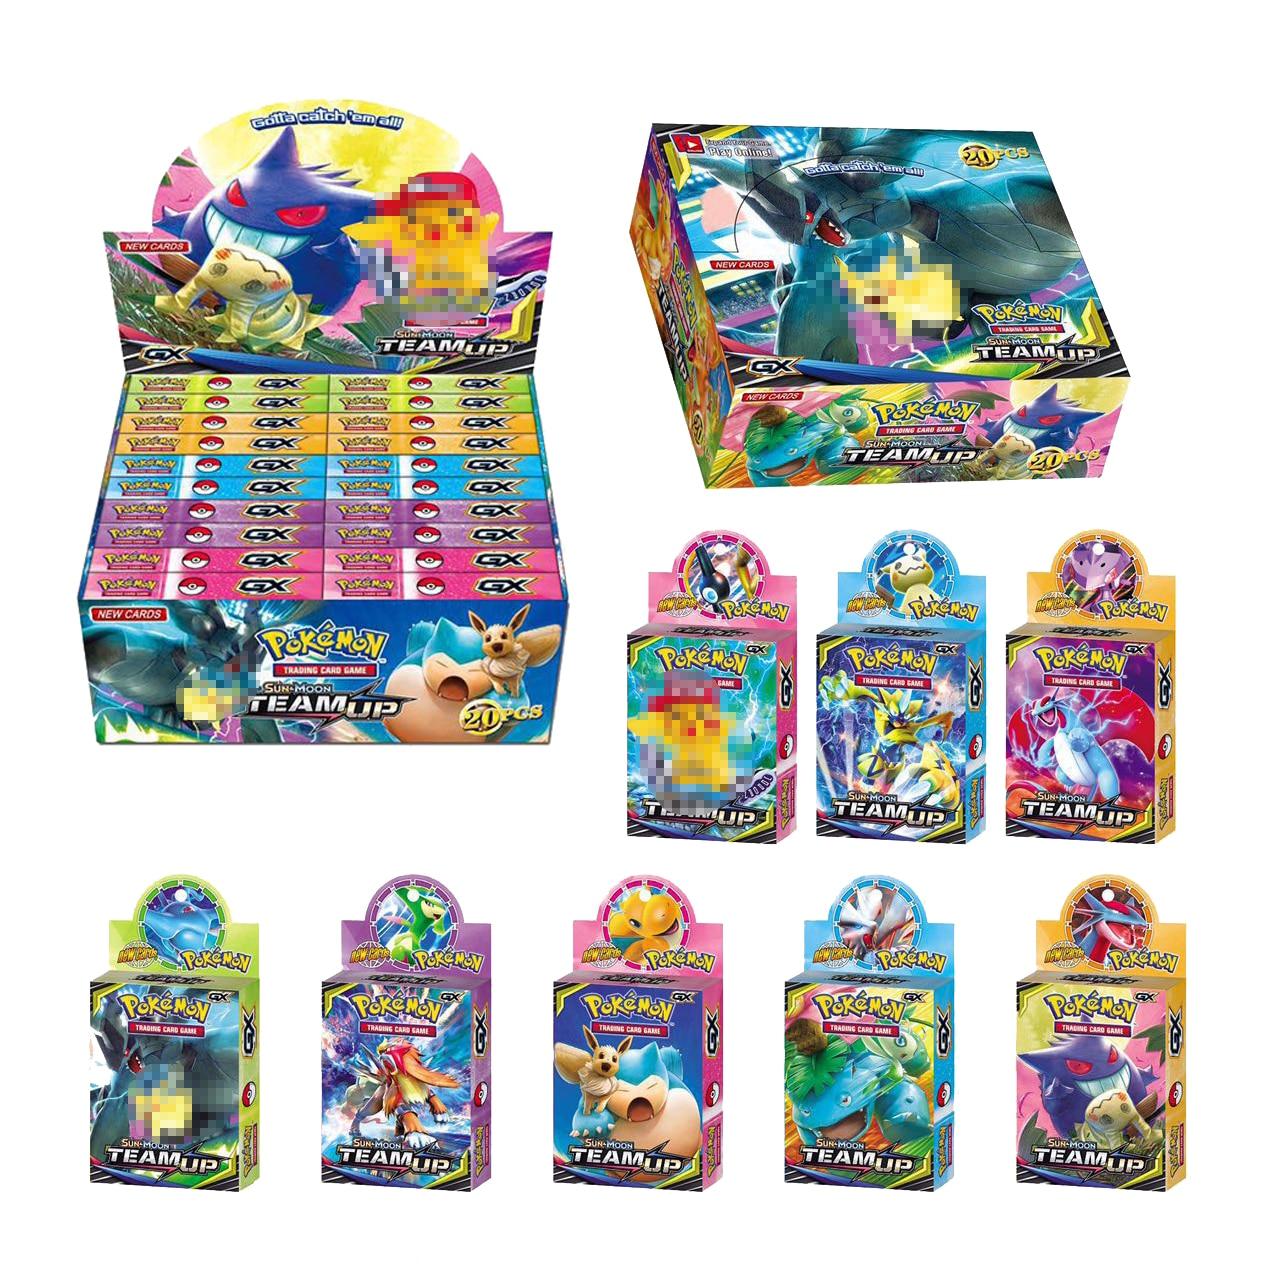 Takara Tomy PTCG Pokemon Cards 33PCS GX EX MEGA  Flash Card Sword Shield Sun Moon Card Collectible Gift Children Toy